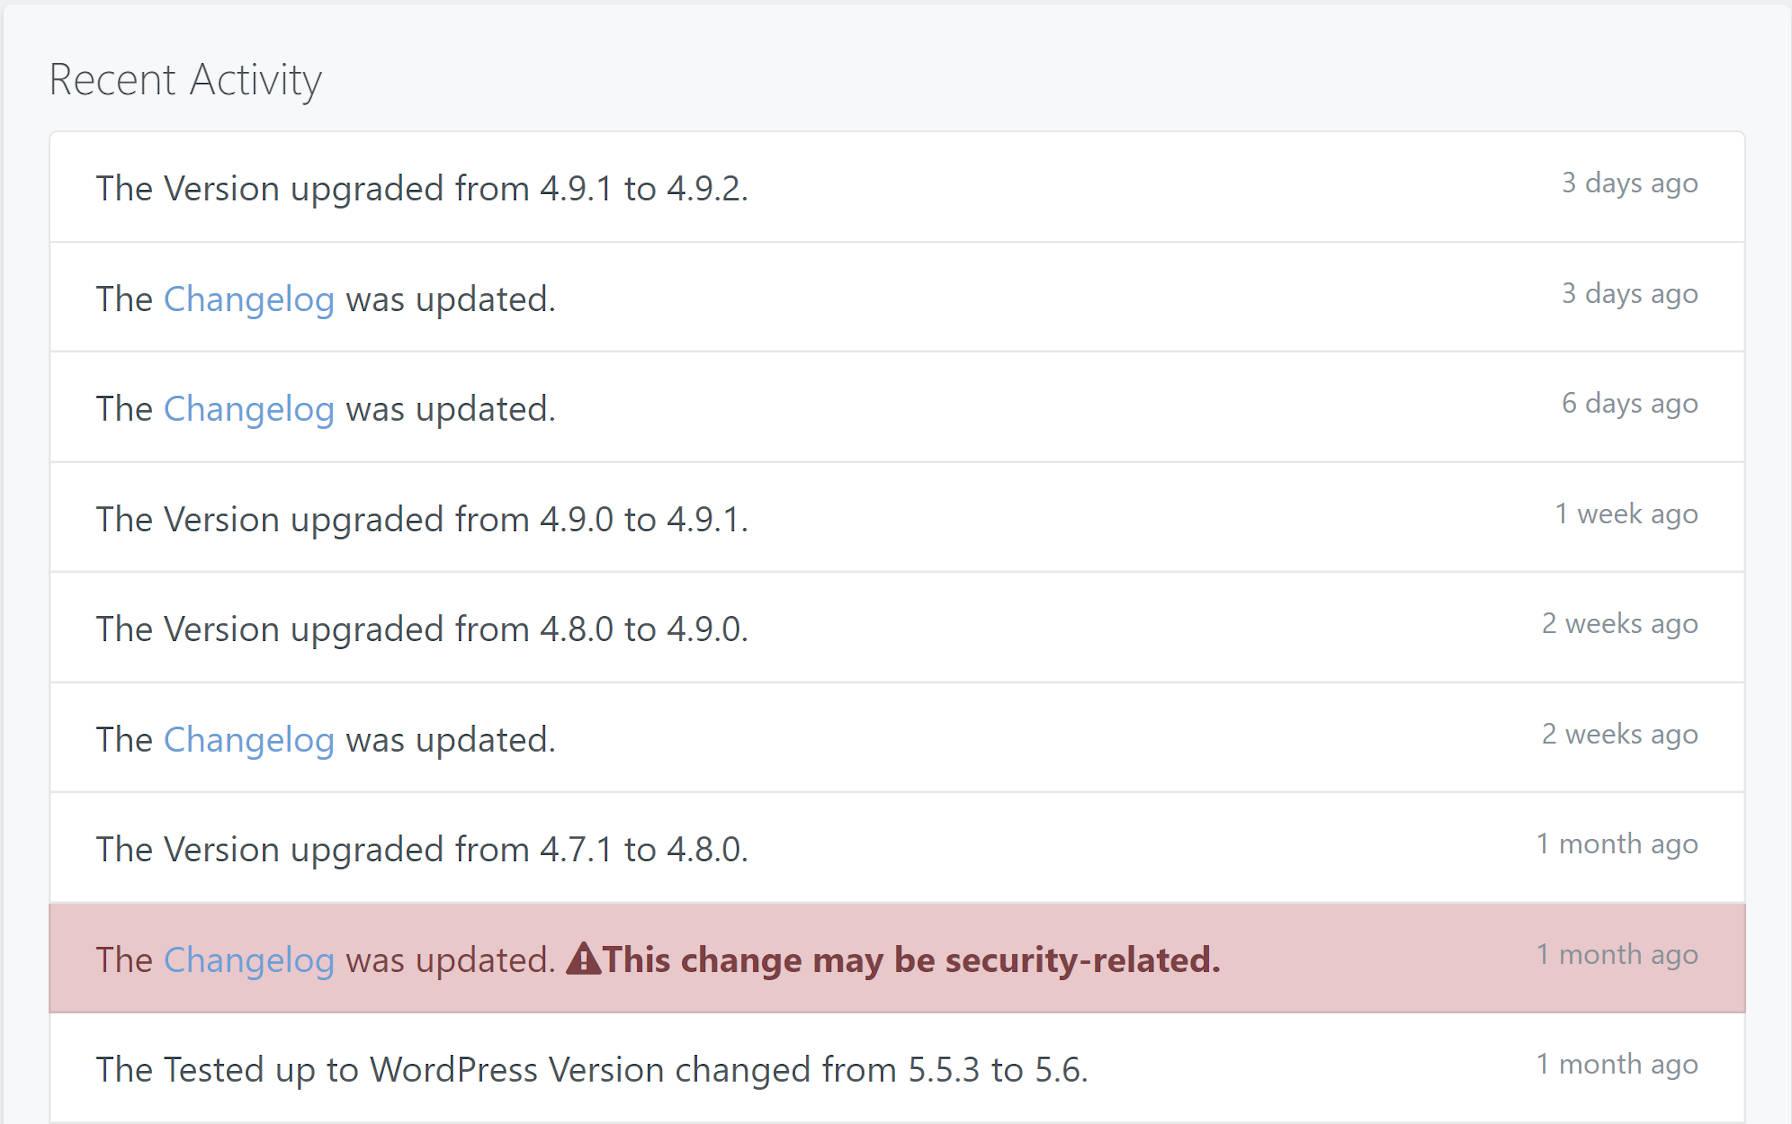 wp-lookout-let-wordpress-users跟蹤和接收其首選插件和主題的通知WP Lookout使WordPress用戶可以跟蹤和接收其首選插件和主題的通知